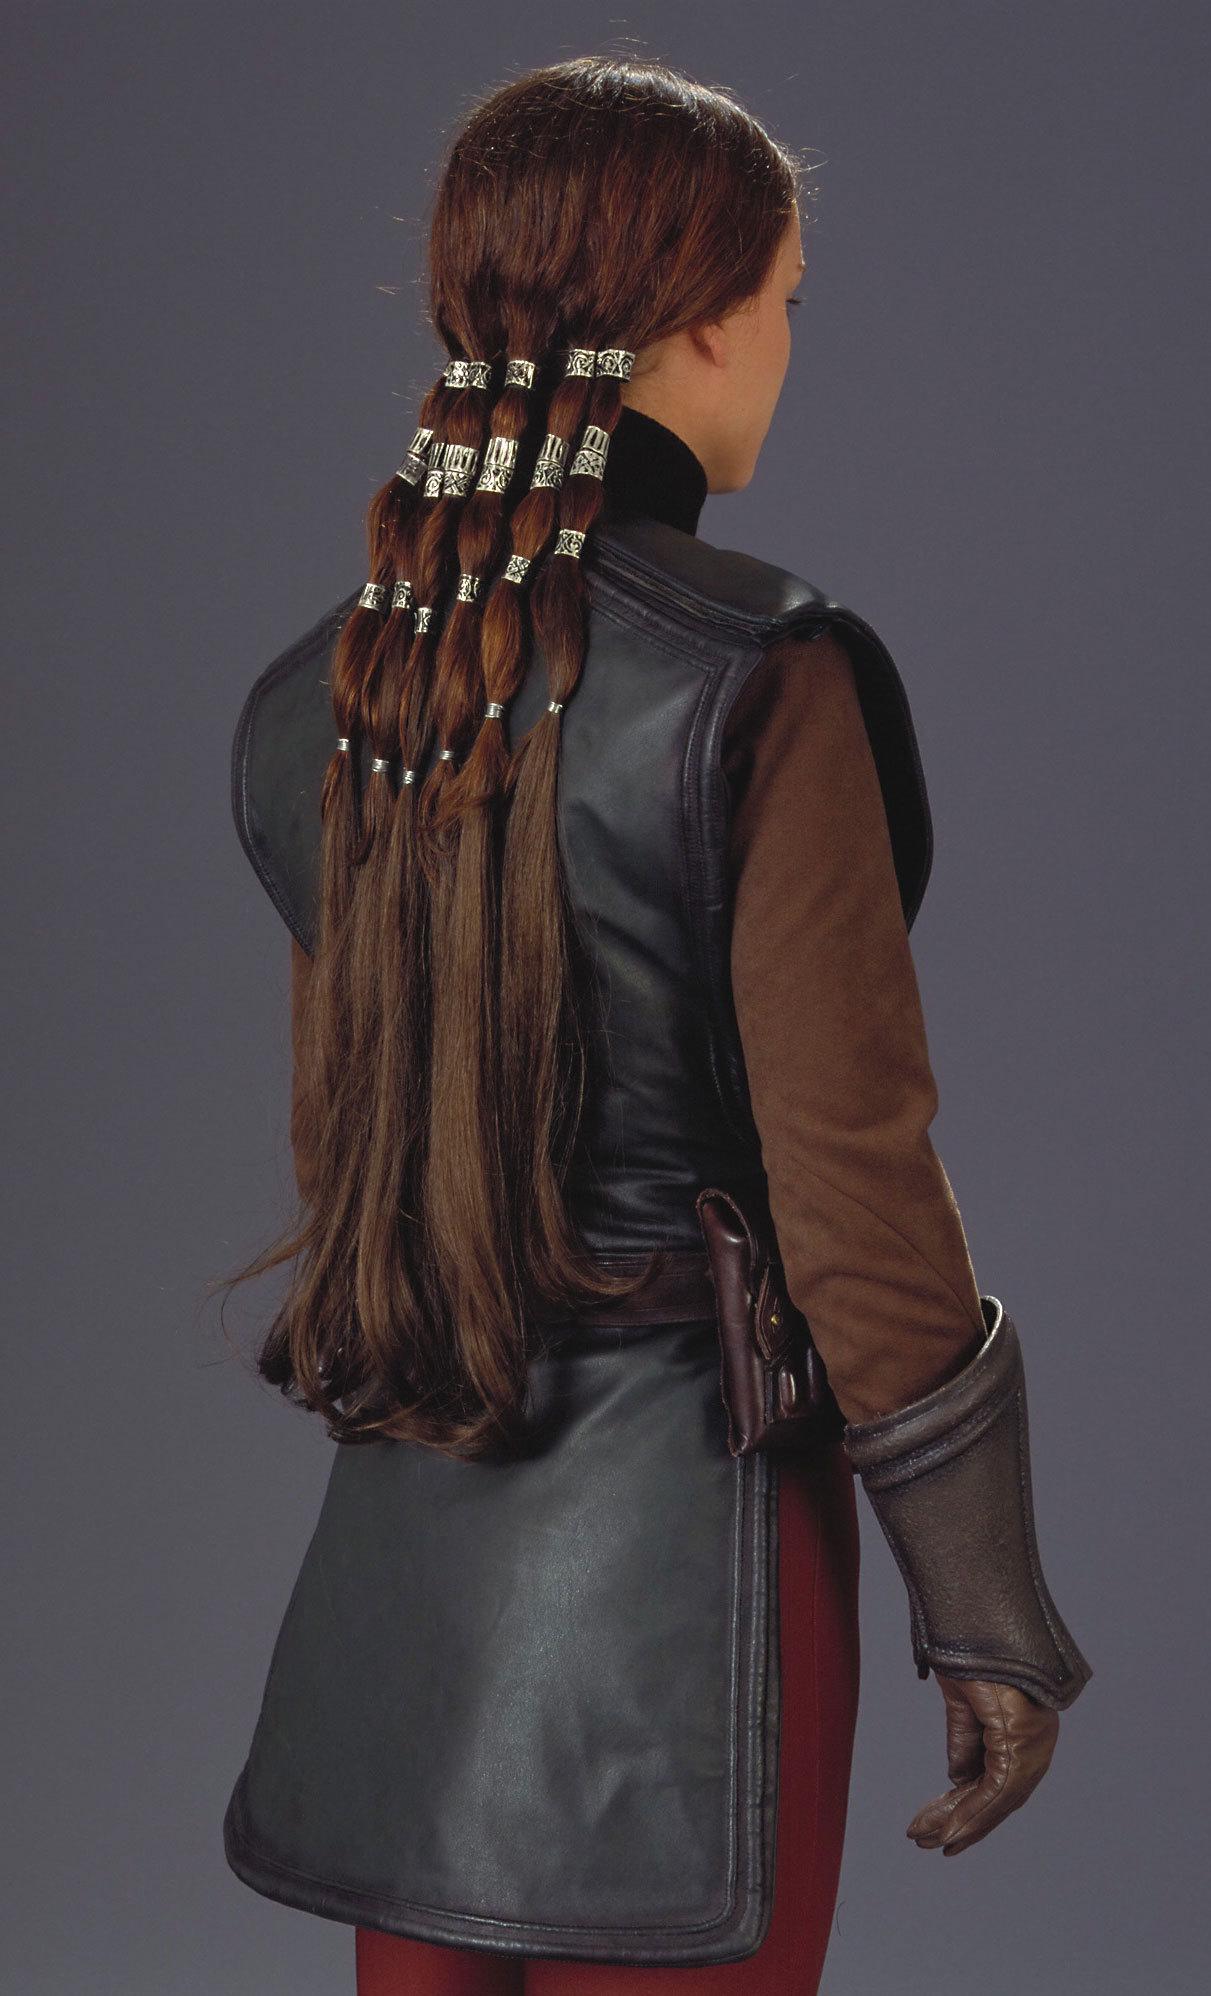 party hairstyles for medium length hair : Padm? Naberrie Amidala Skywalker - Padm? Naberrie Amidala Skywalker ...